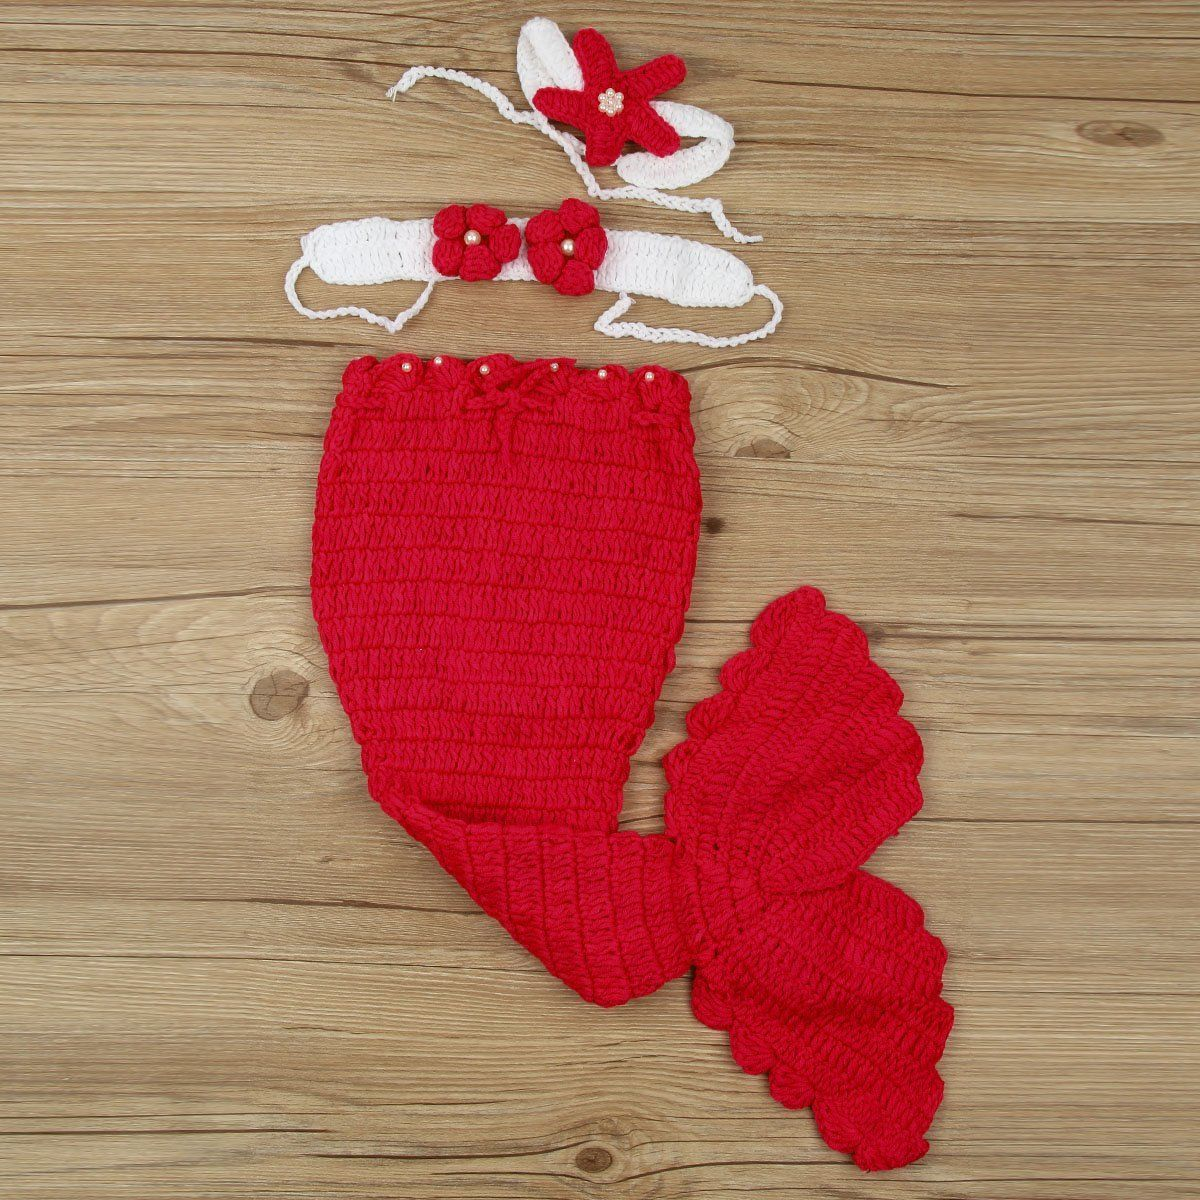 Pasgeboren Baby Mermaid Fishtail Knit Haak Slaapzak Beha Hoofdband